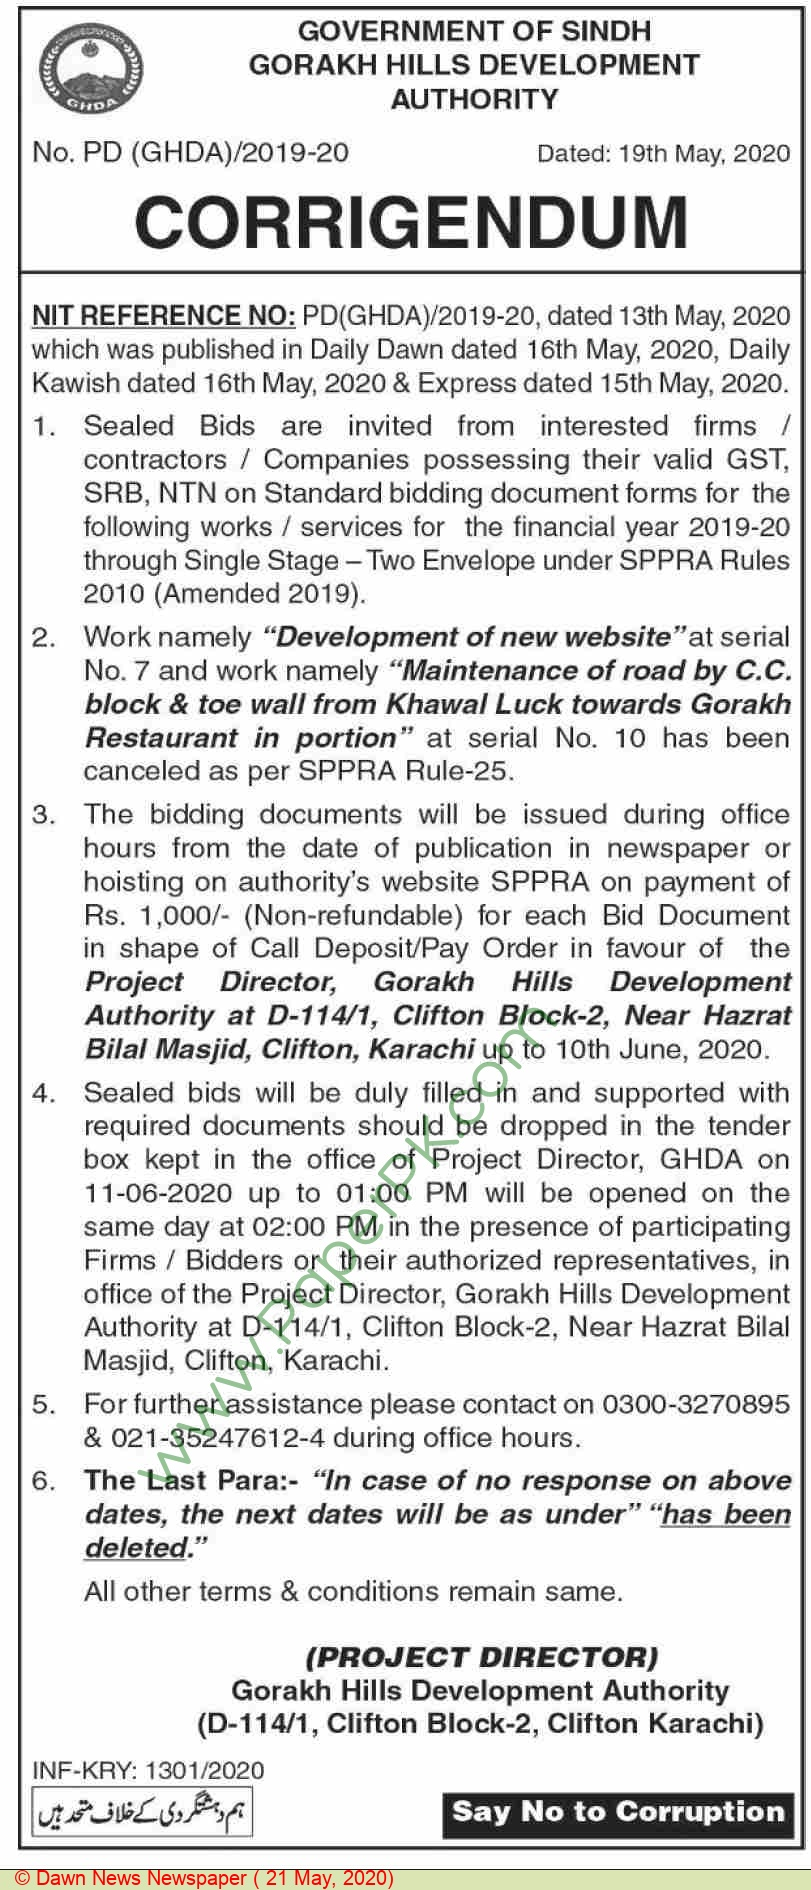 Gorakh Hills Development Authority Karachi Tender Notice